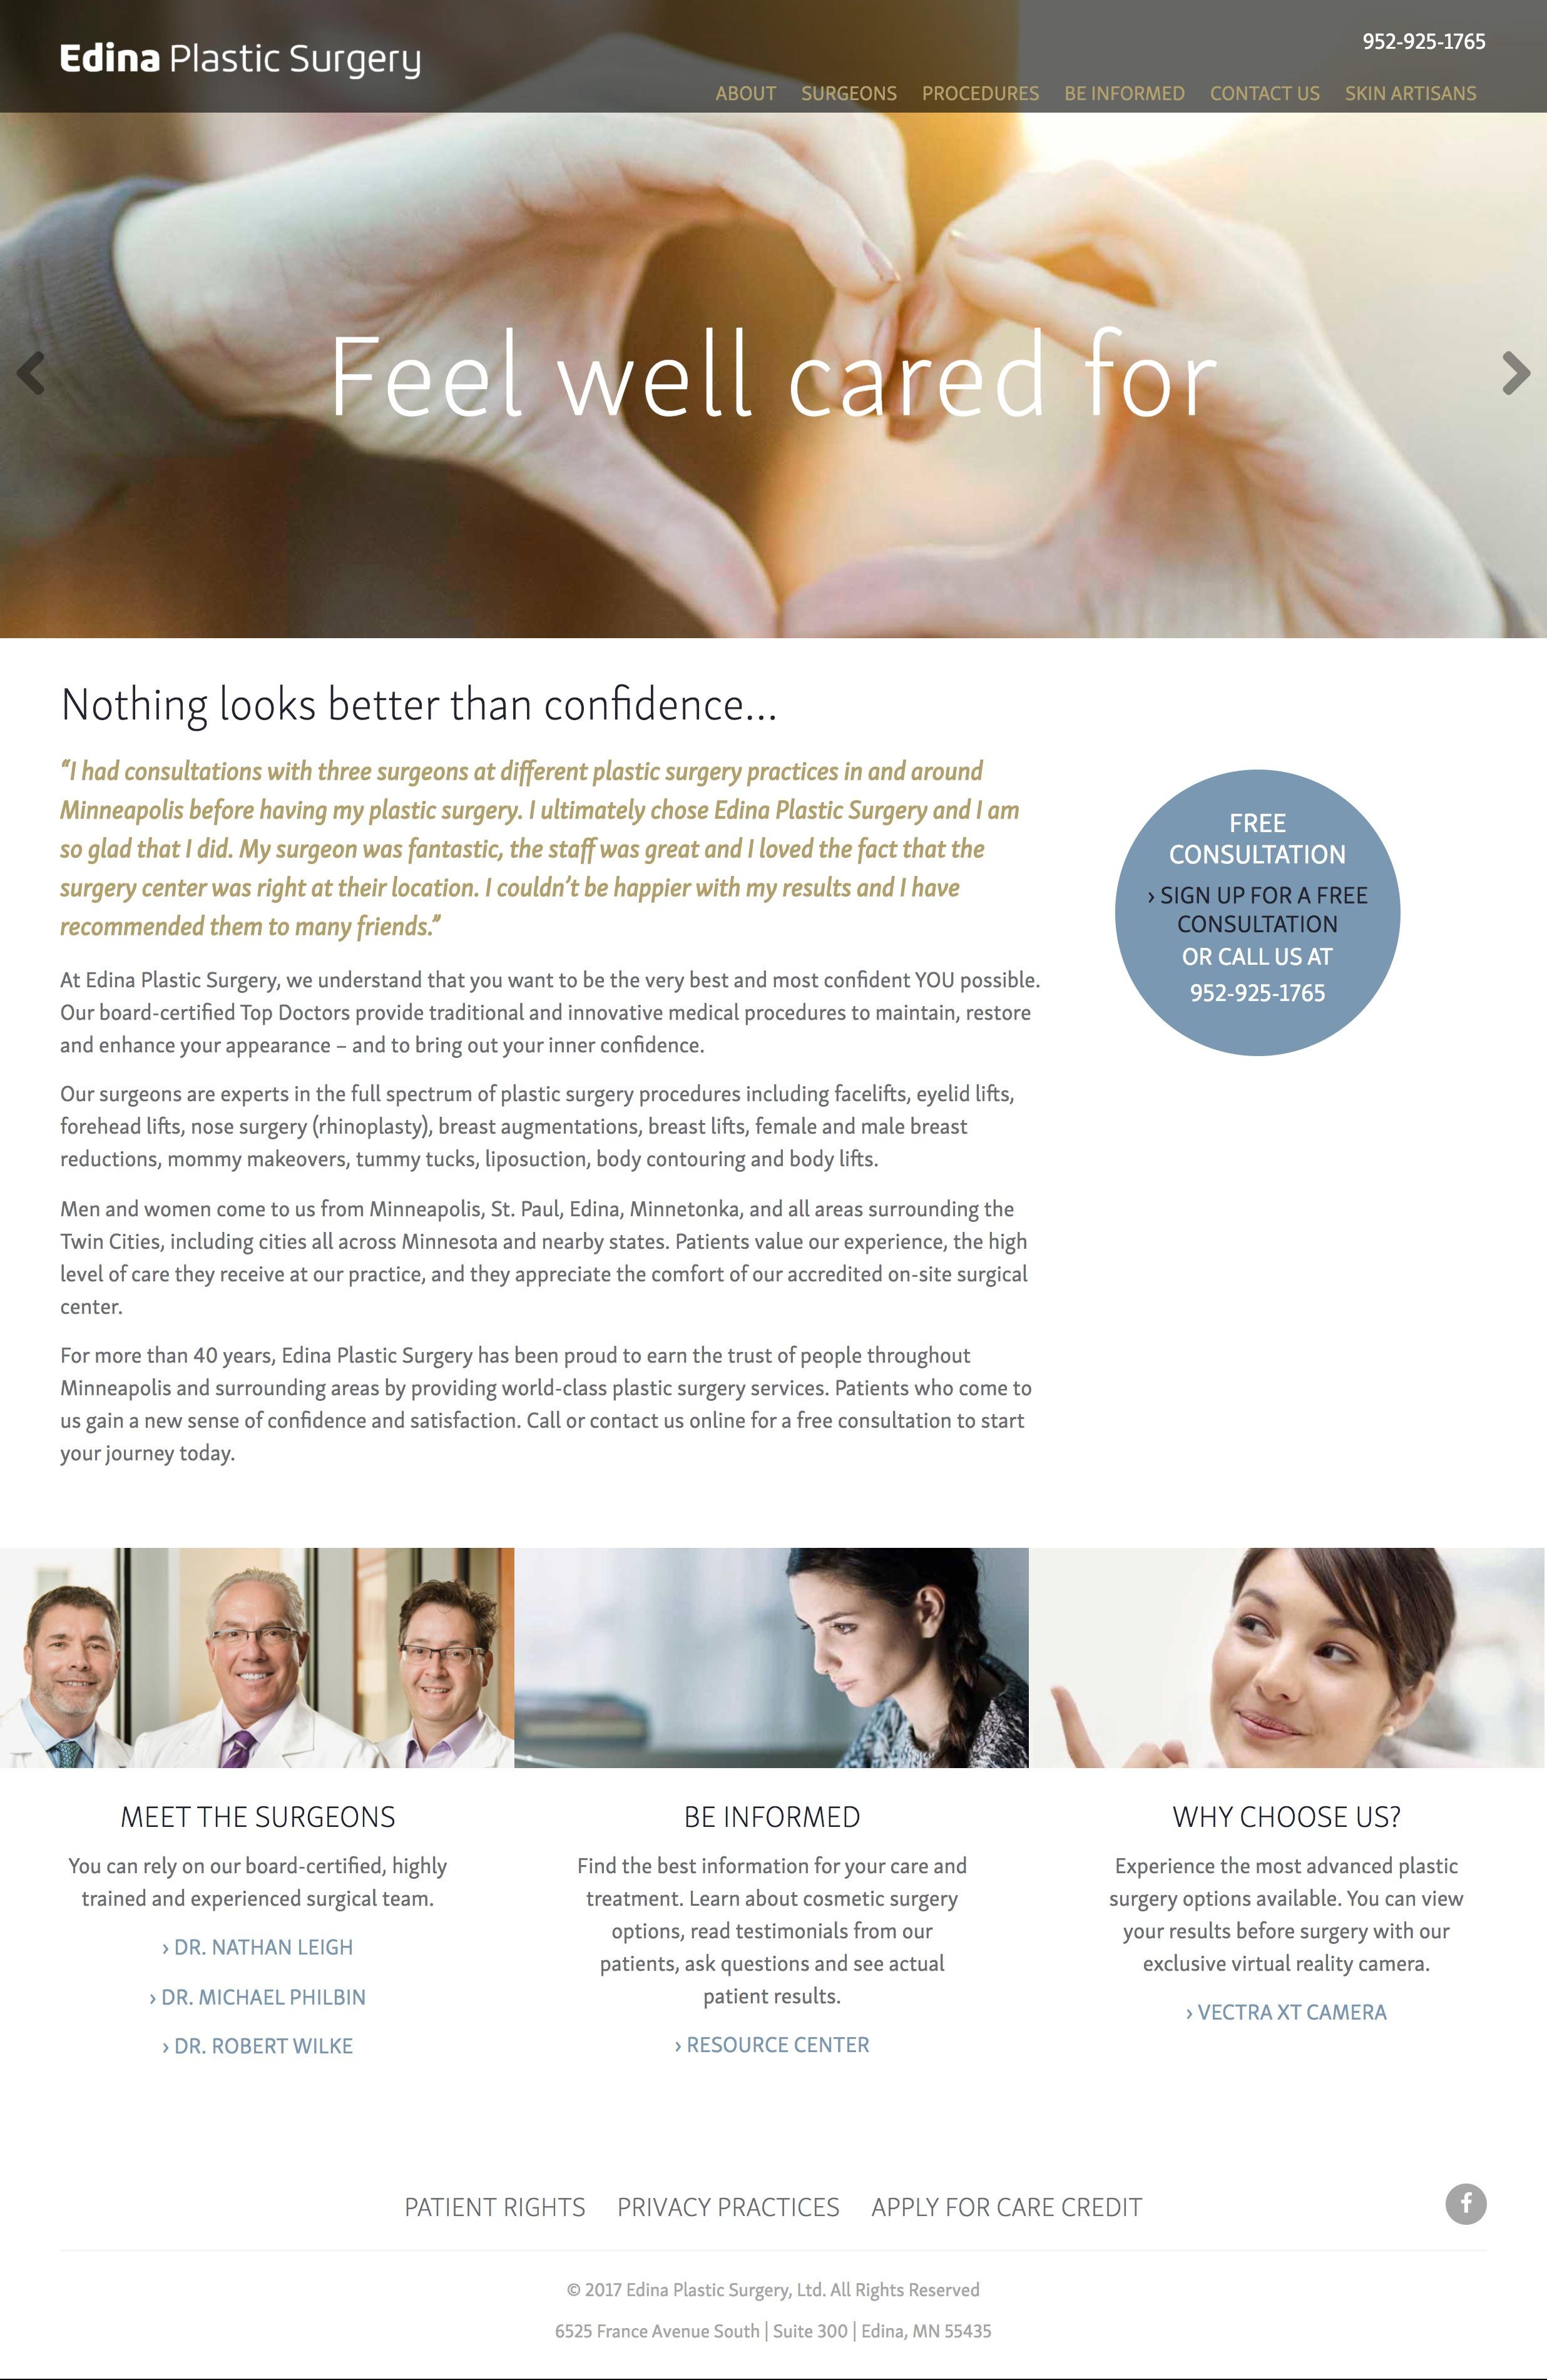 Edina Plastic Surgery Medical Surgical Web Design Layout